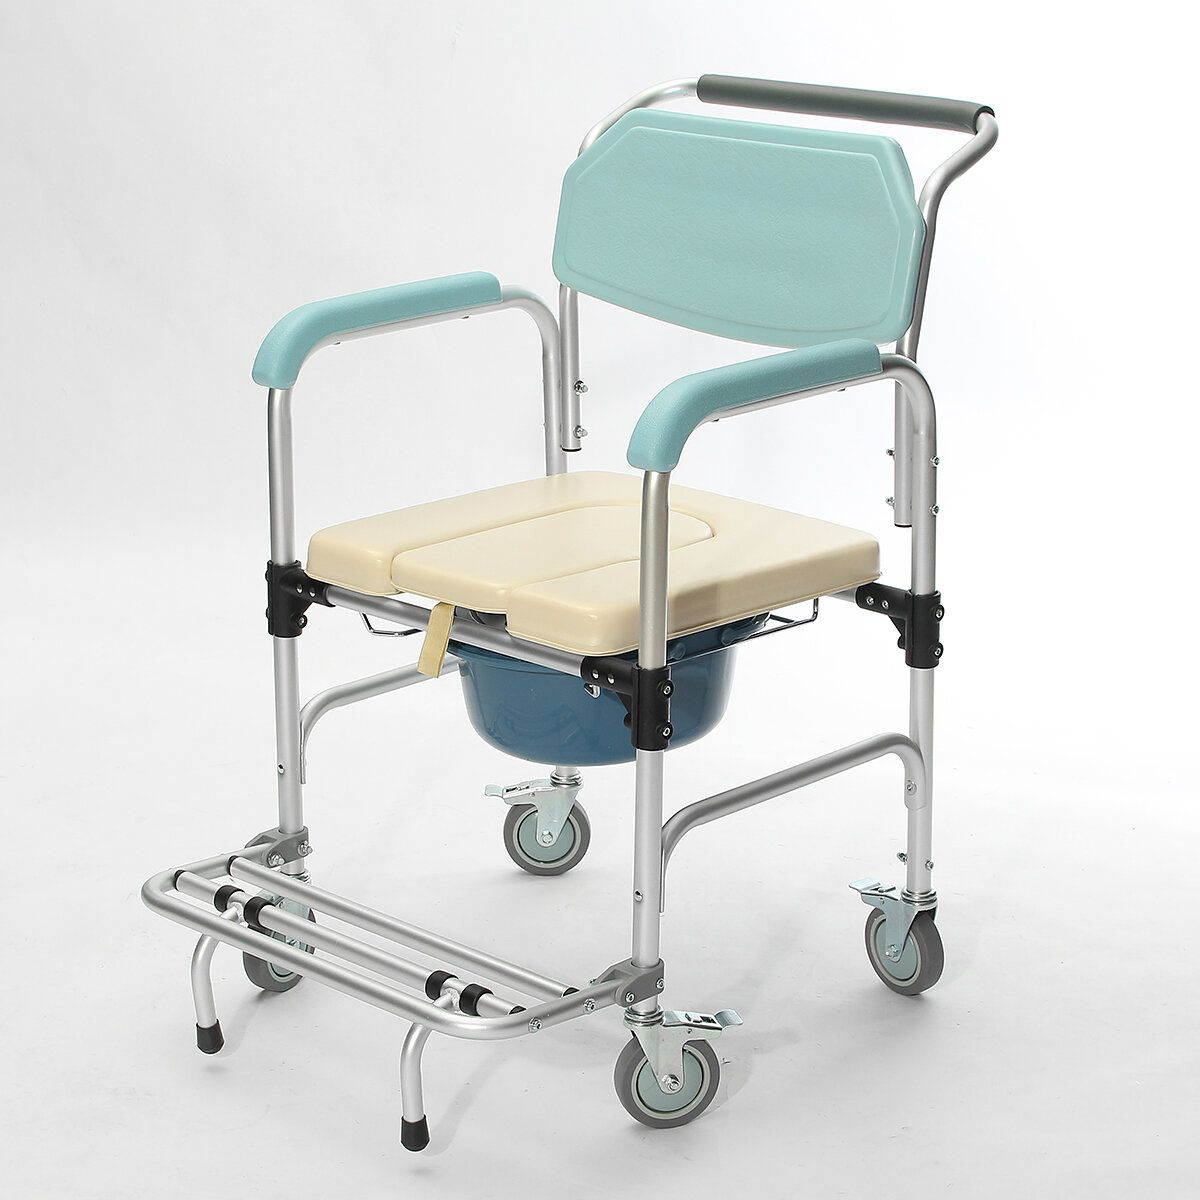 YFZ US$270.56 3-in-1 Commode Wheelchair Bedside Toilet & Shower Seat Bathroom Rolling Chair Elder Folding Chair